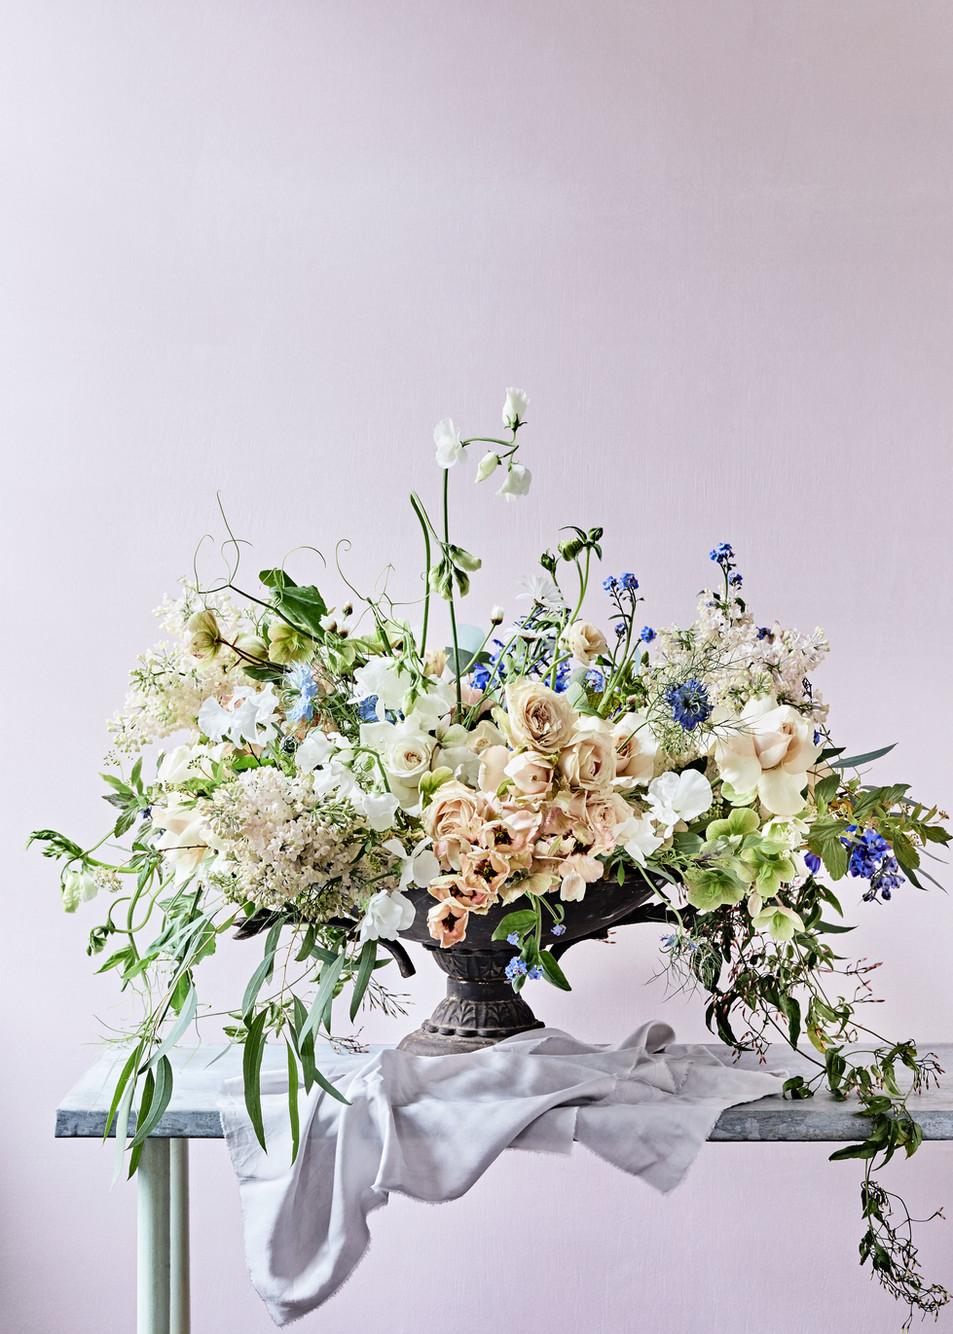 190317_JamJarEdit_FlowerArrangement_460